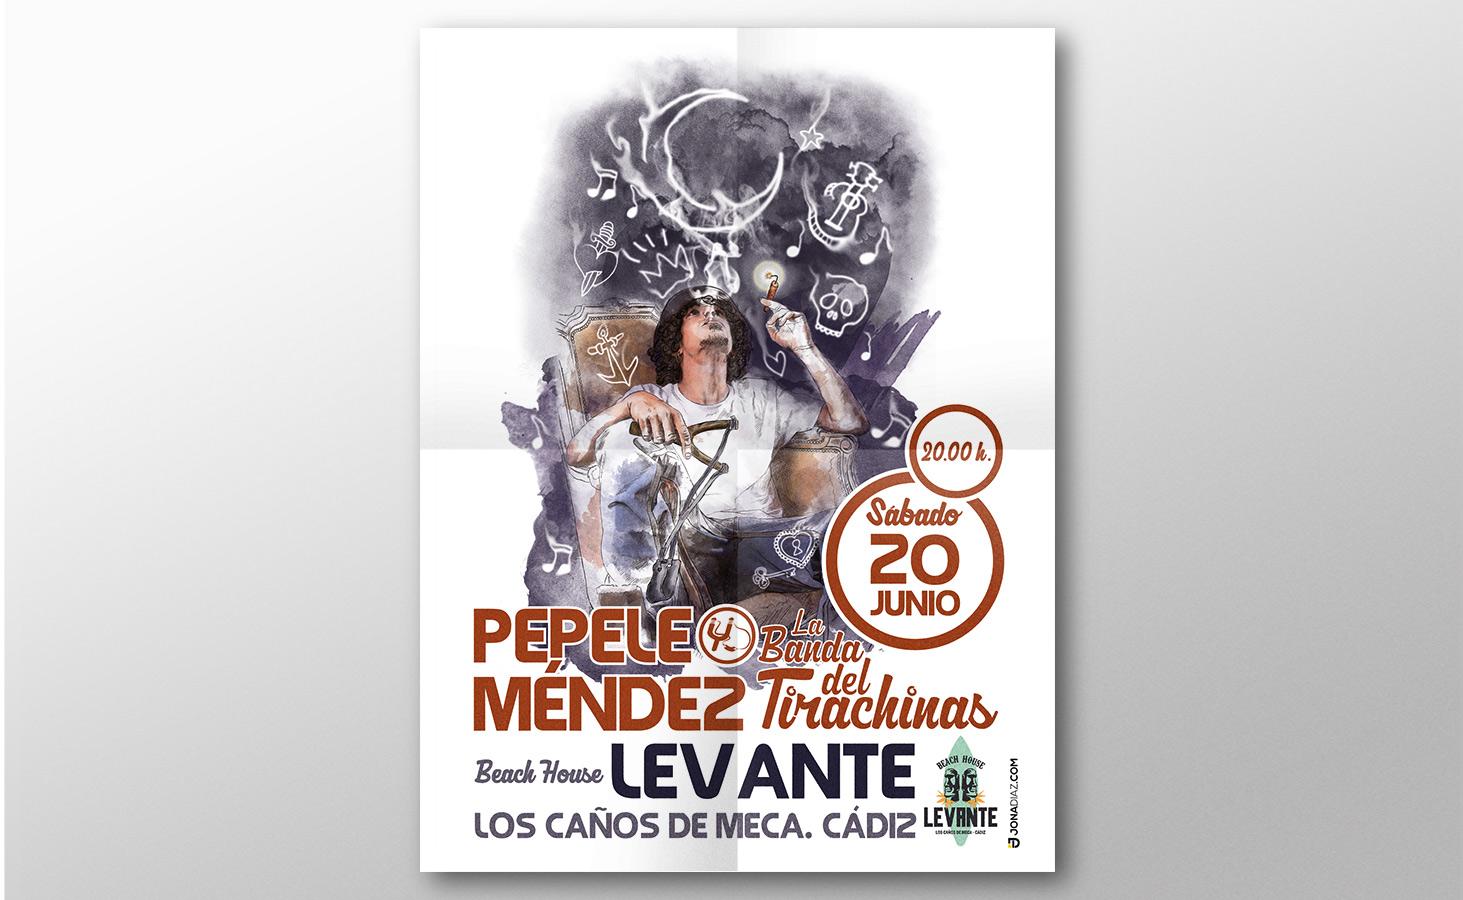 cartel_pepele_mendez-02